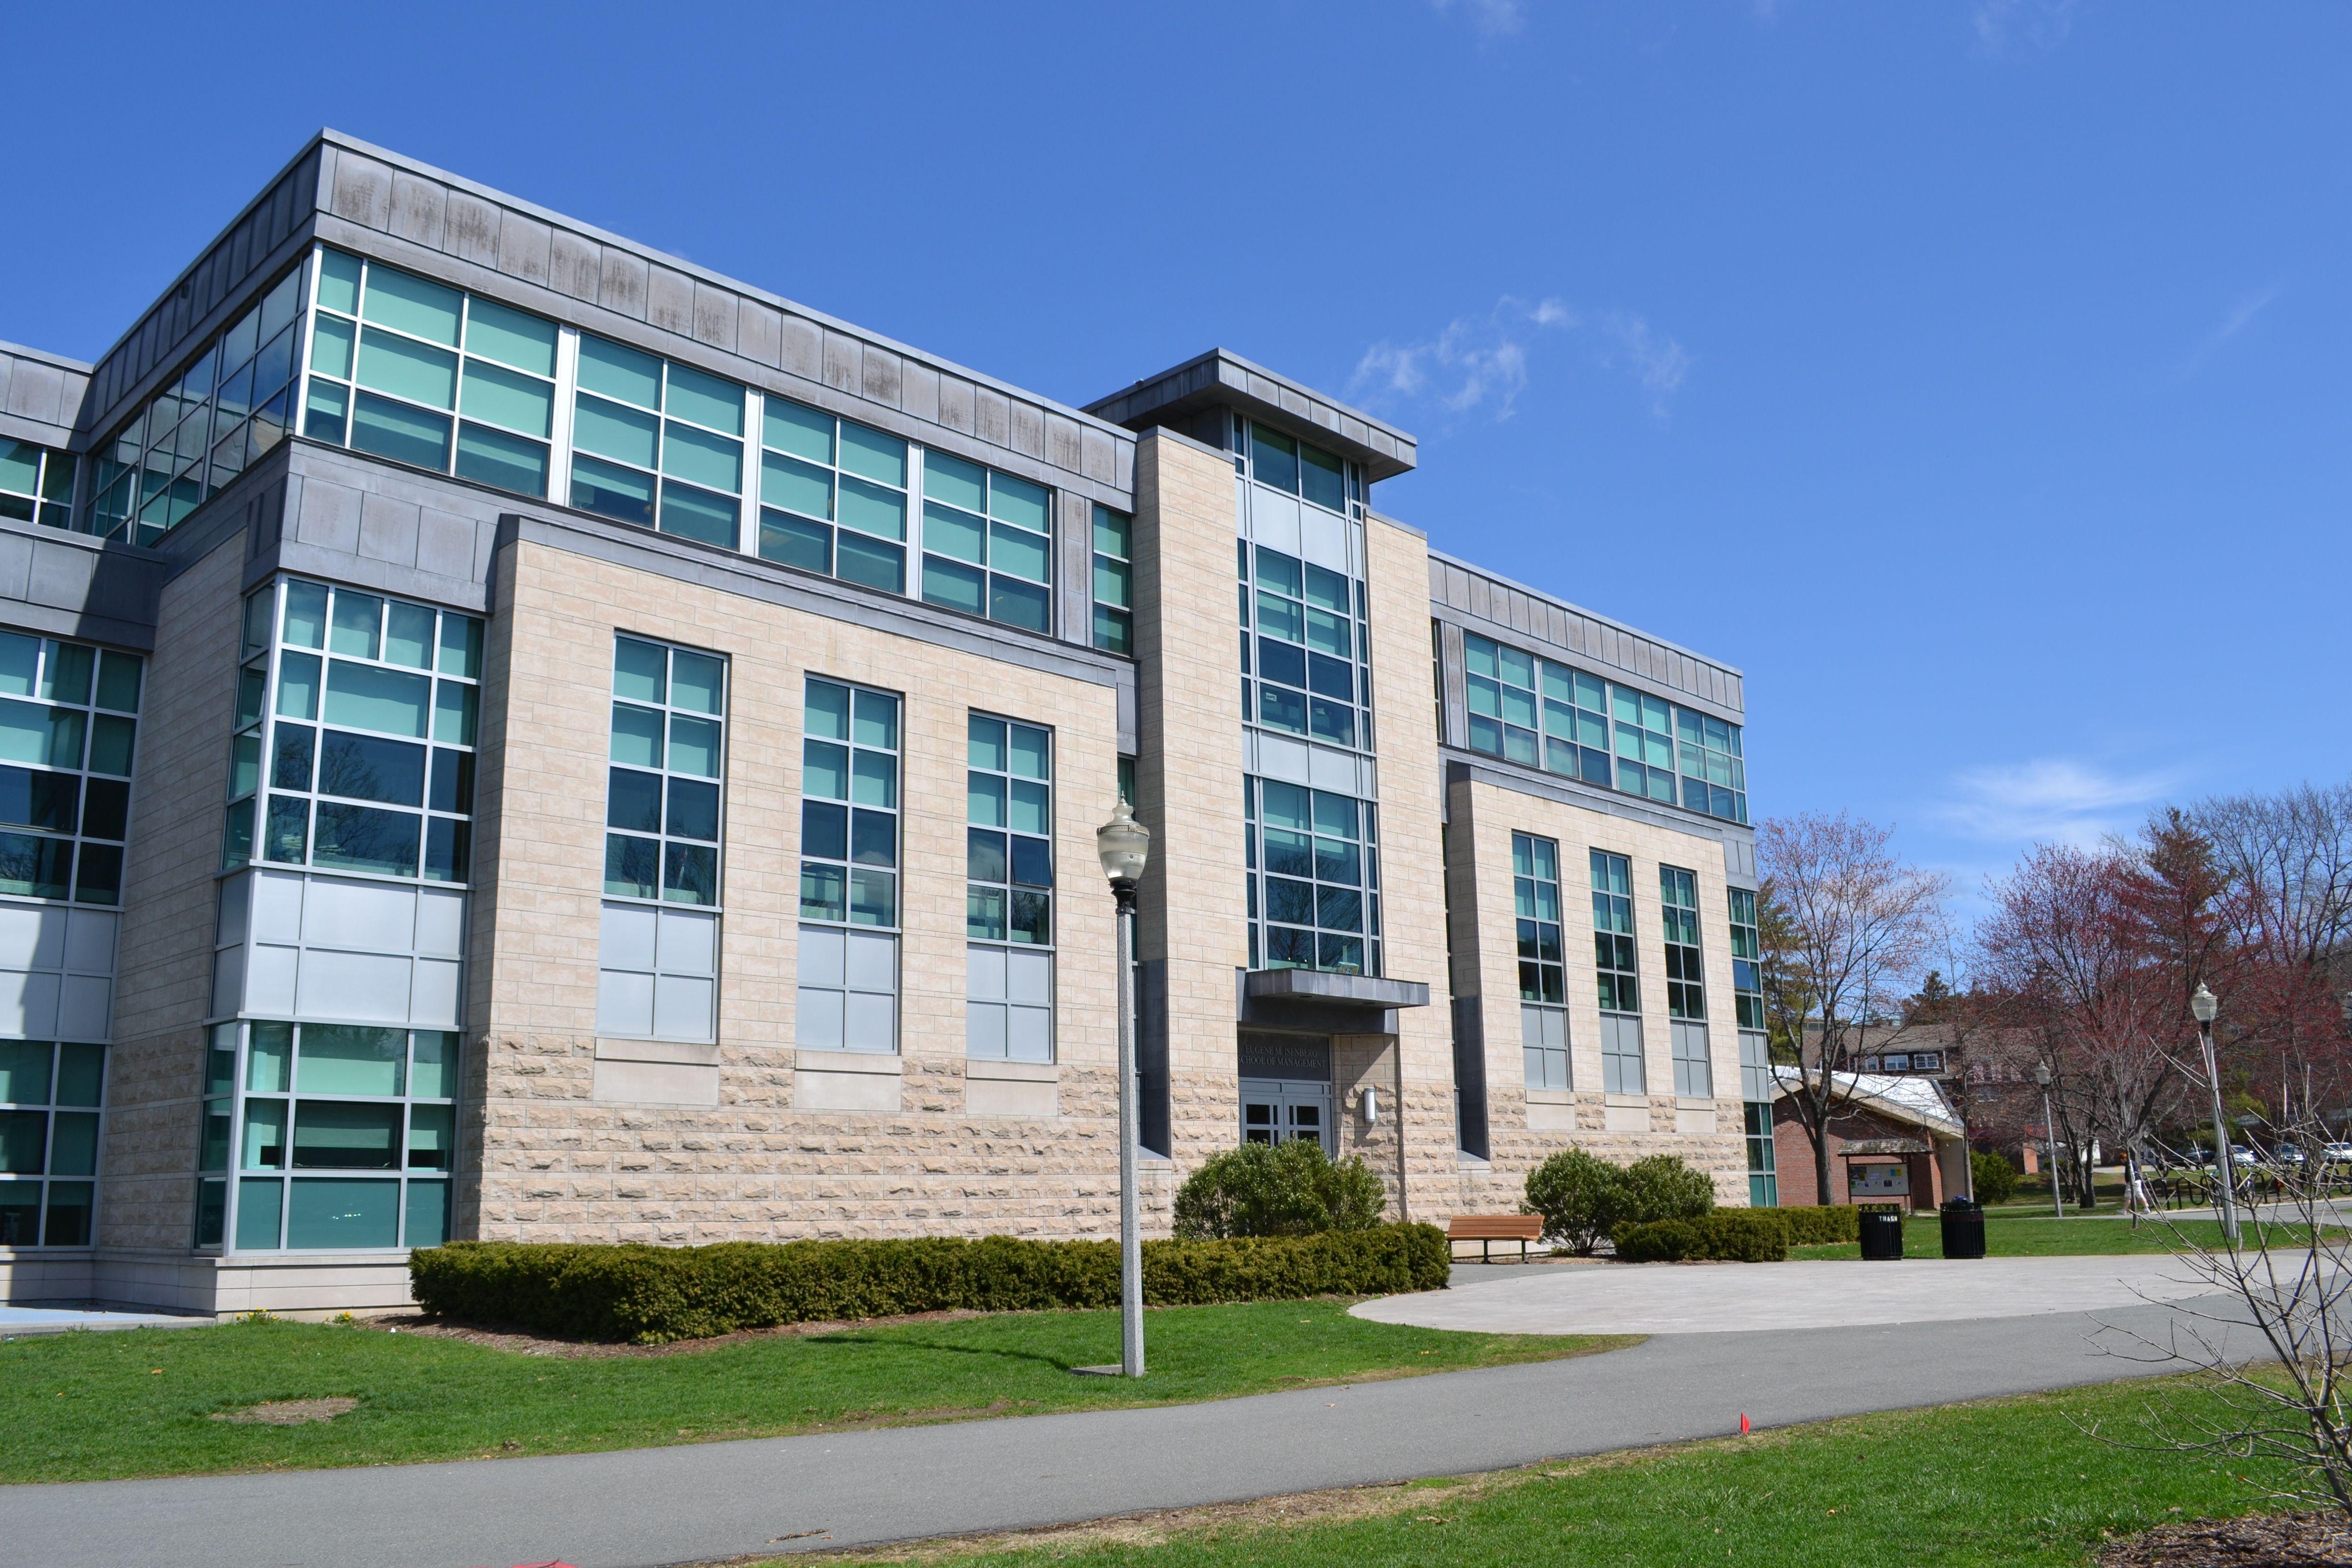 Isenberg School of Management, UMass Amherst